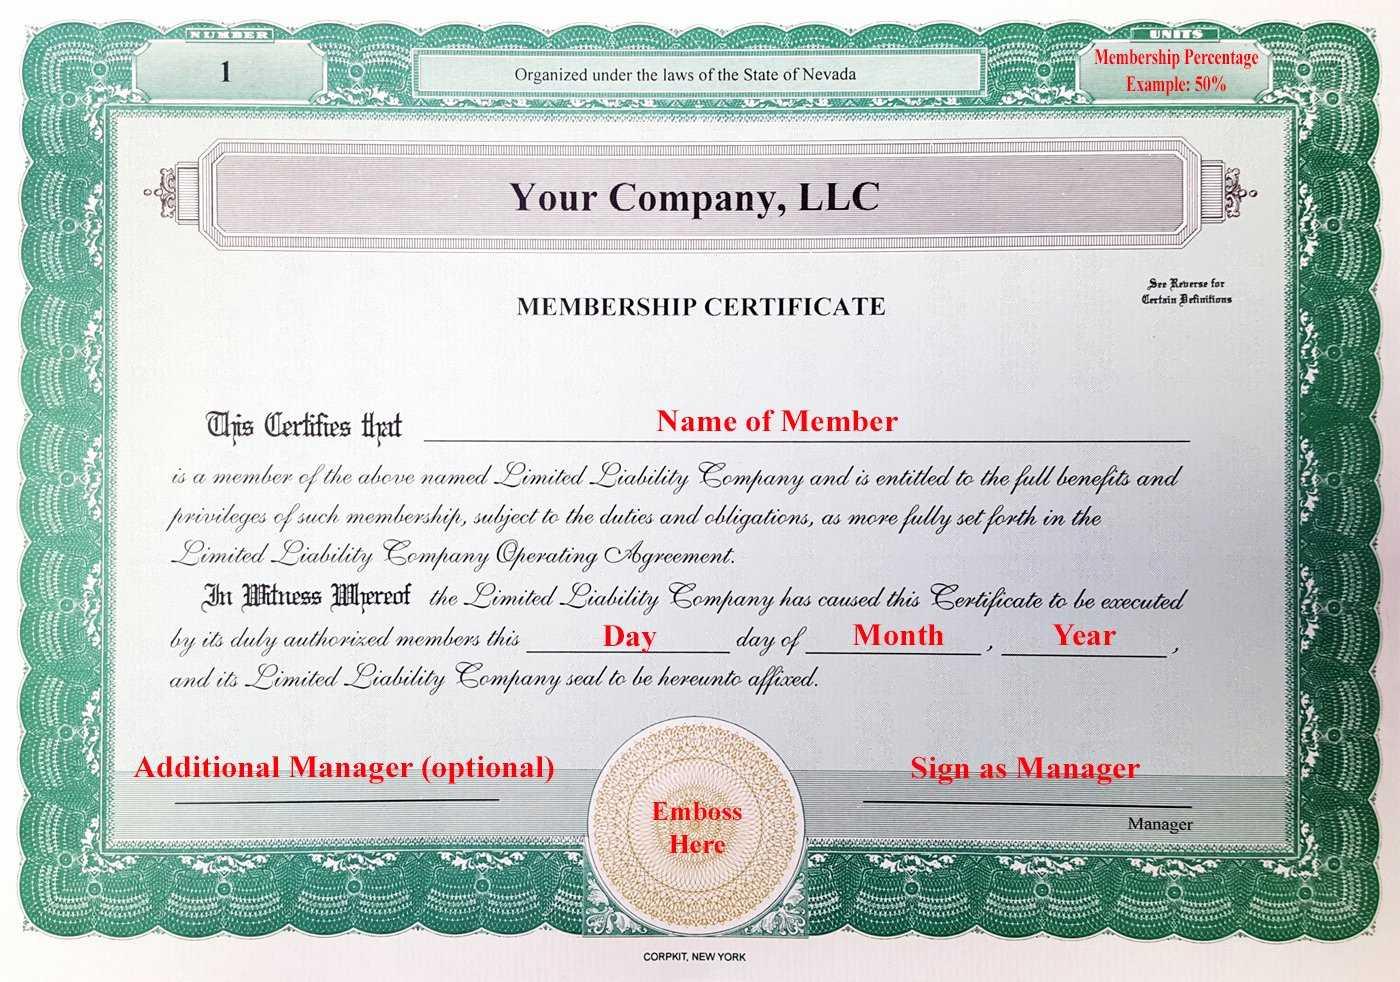 Llc Membership Certificates Templates - Tomope.zaribanks.co Regarding Llc Membership Certificate Template Word